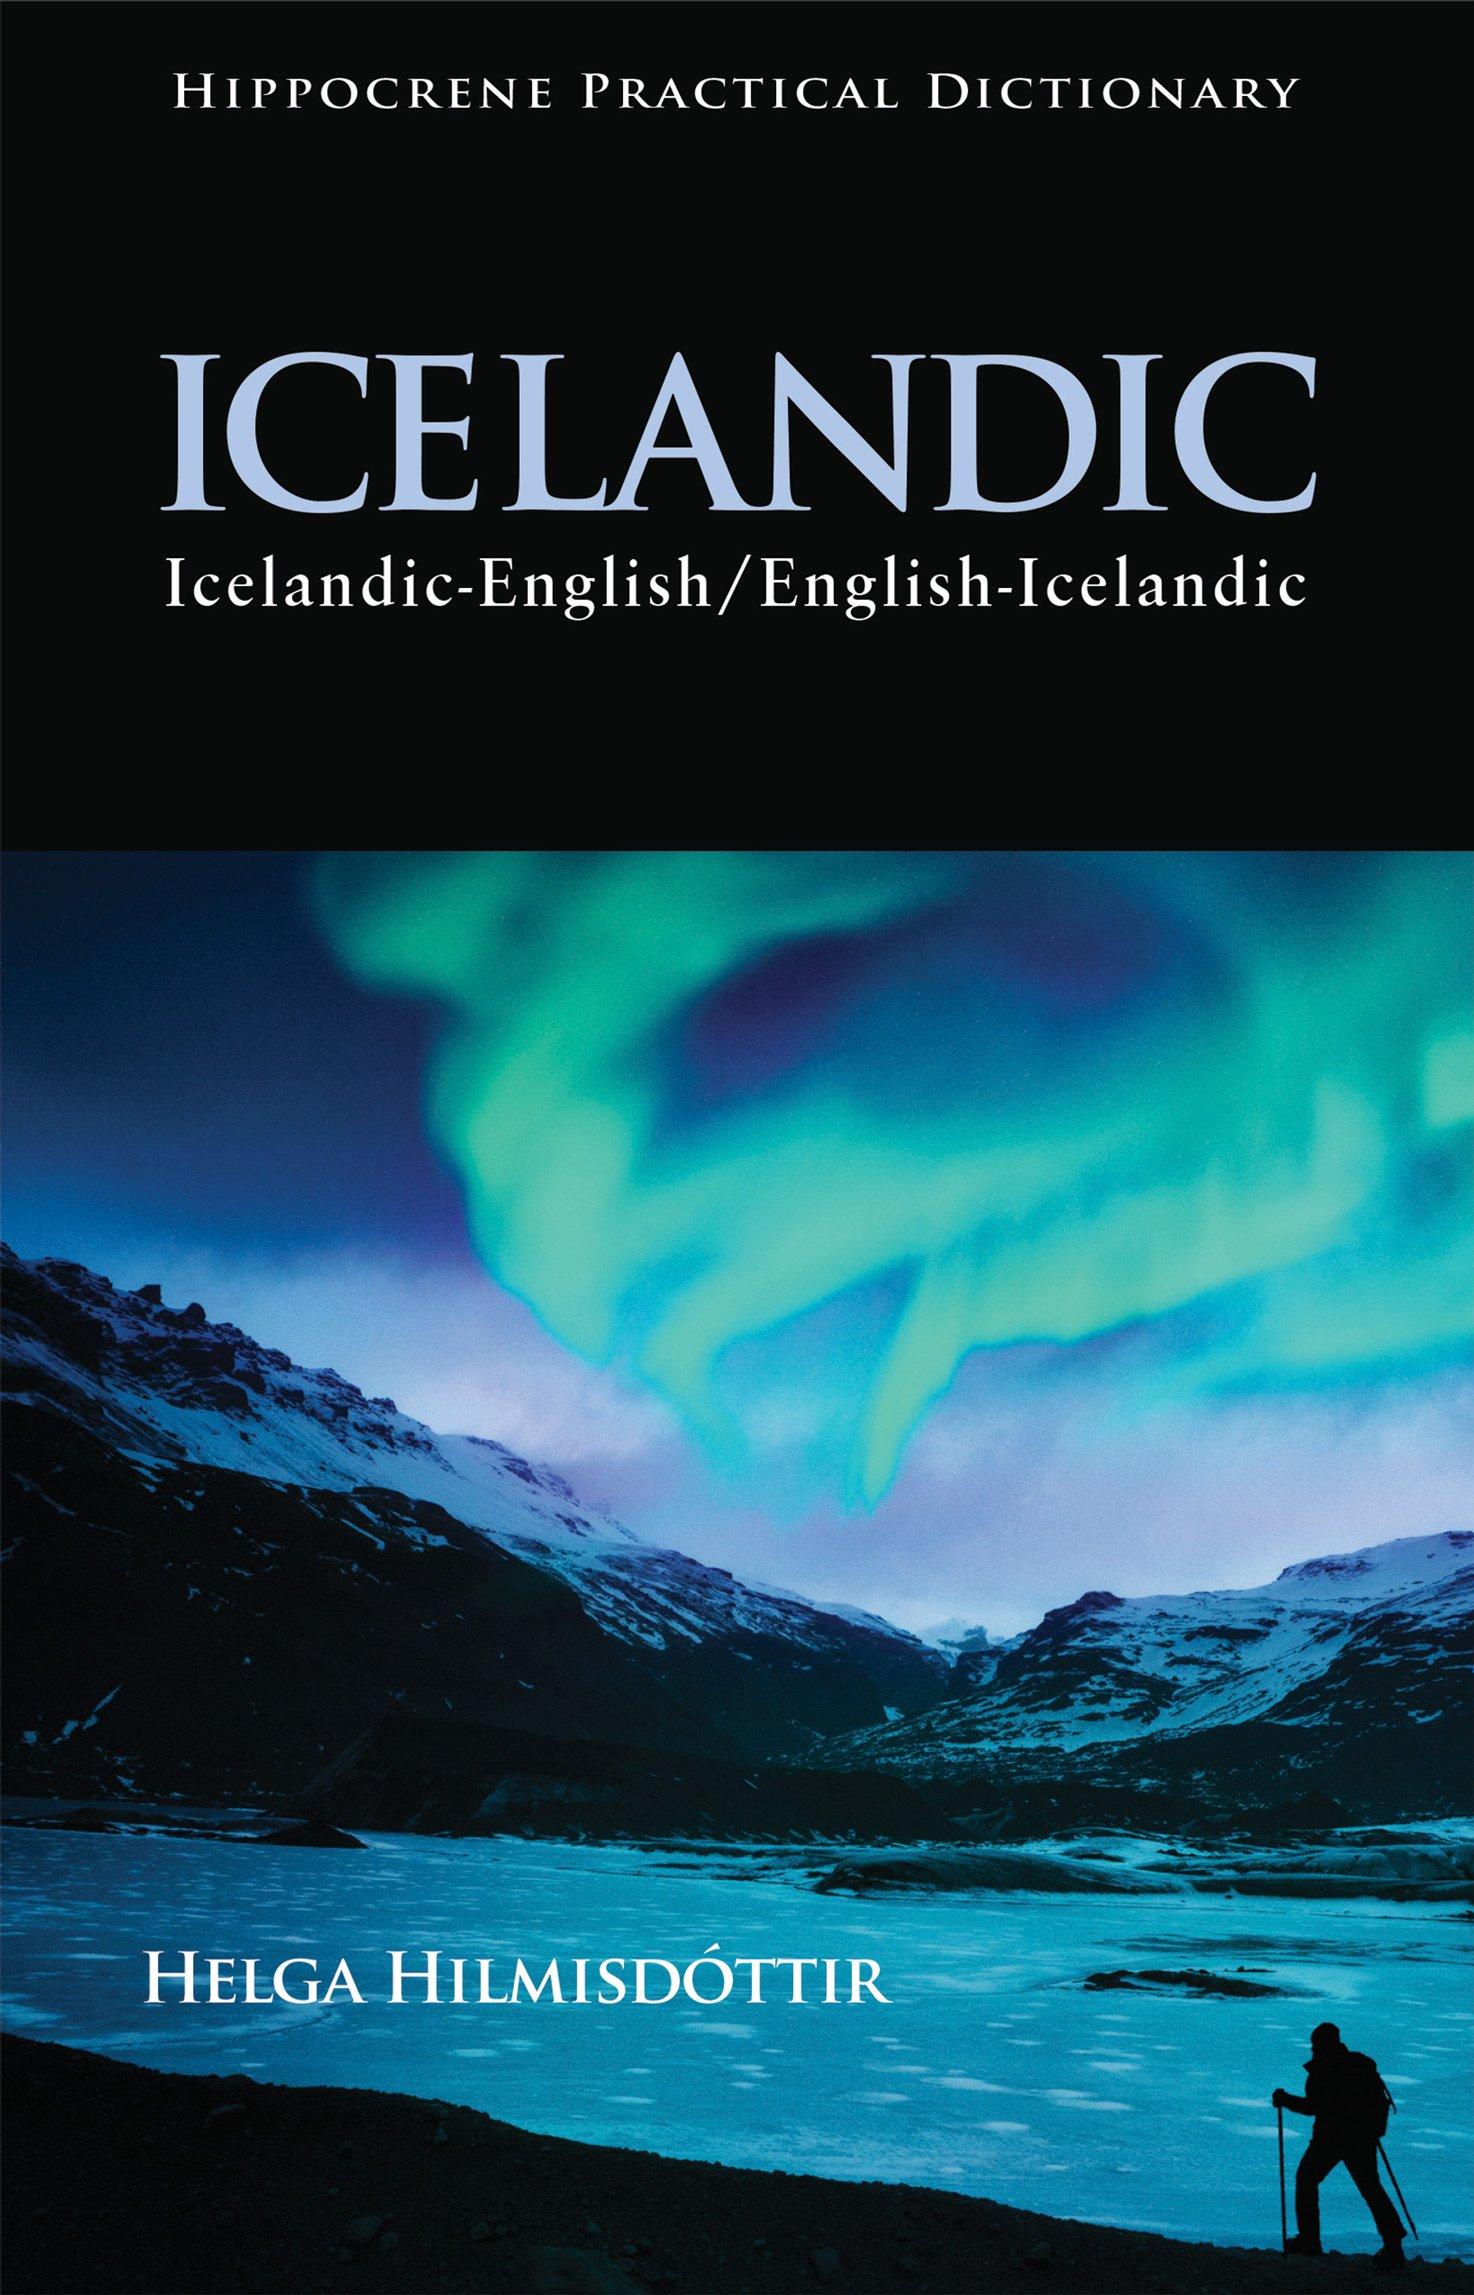 Image for Icelandic-English/English-Icelandic Practical Dictionary